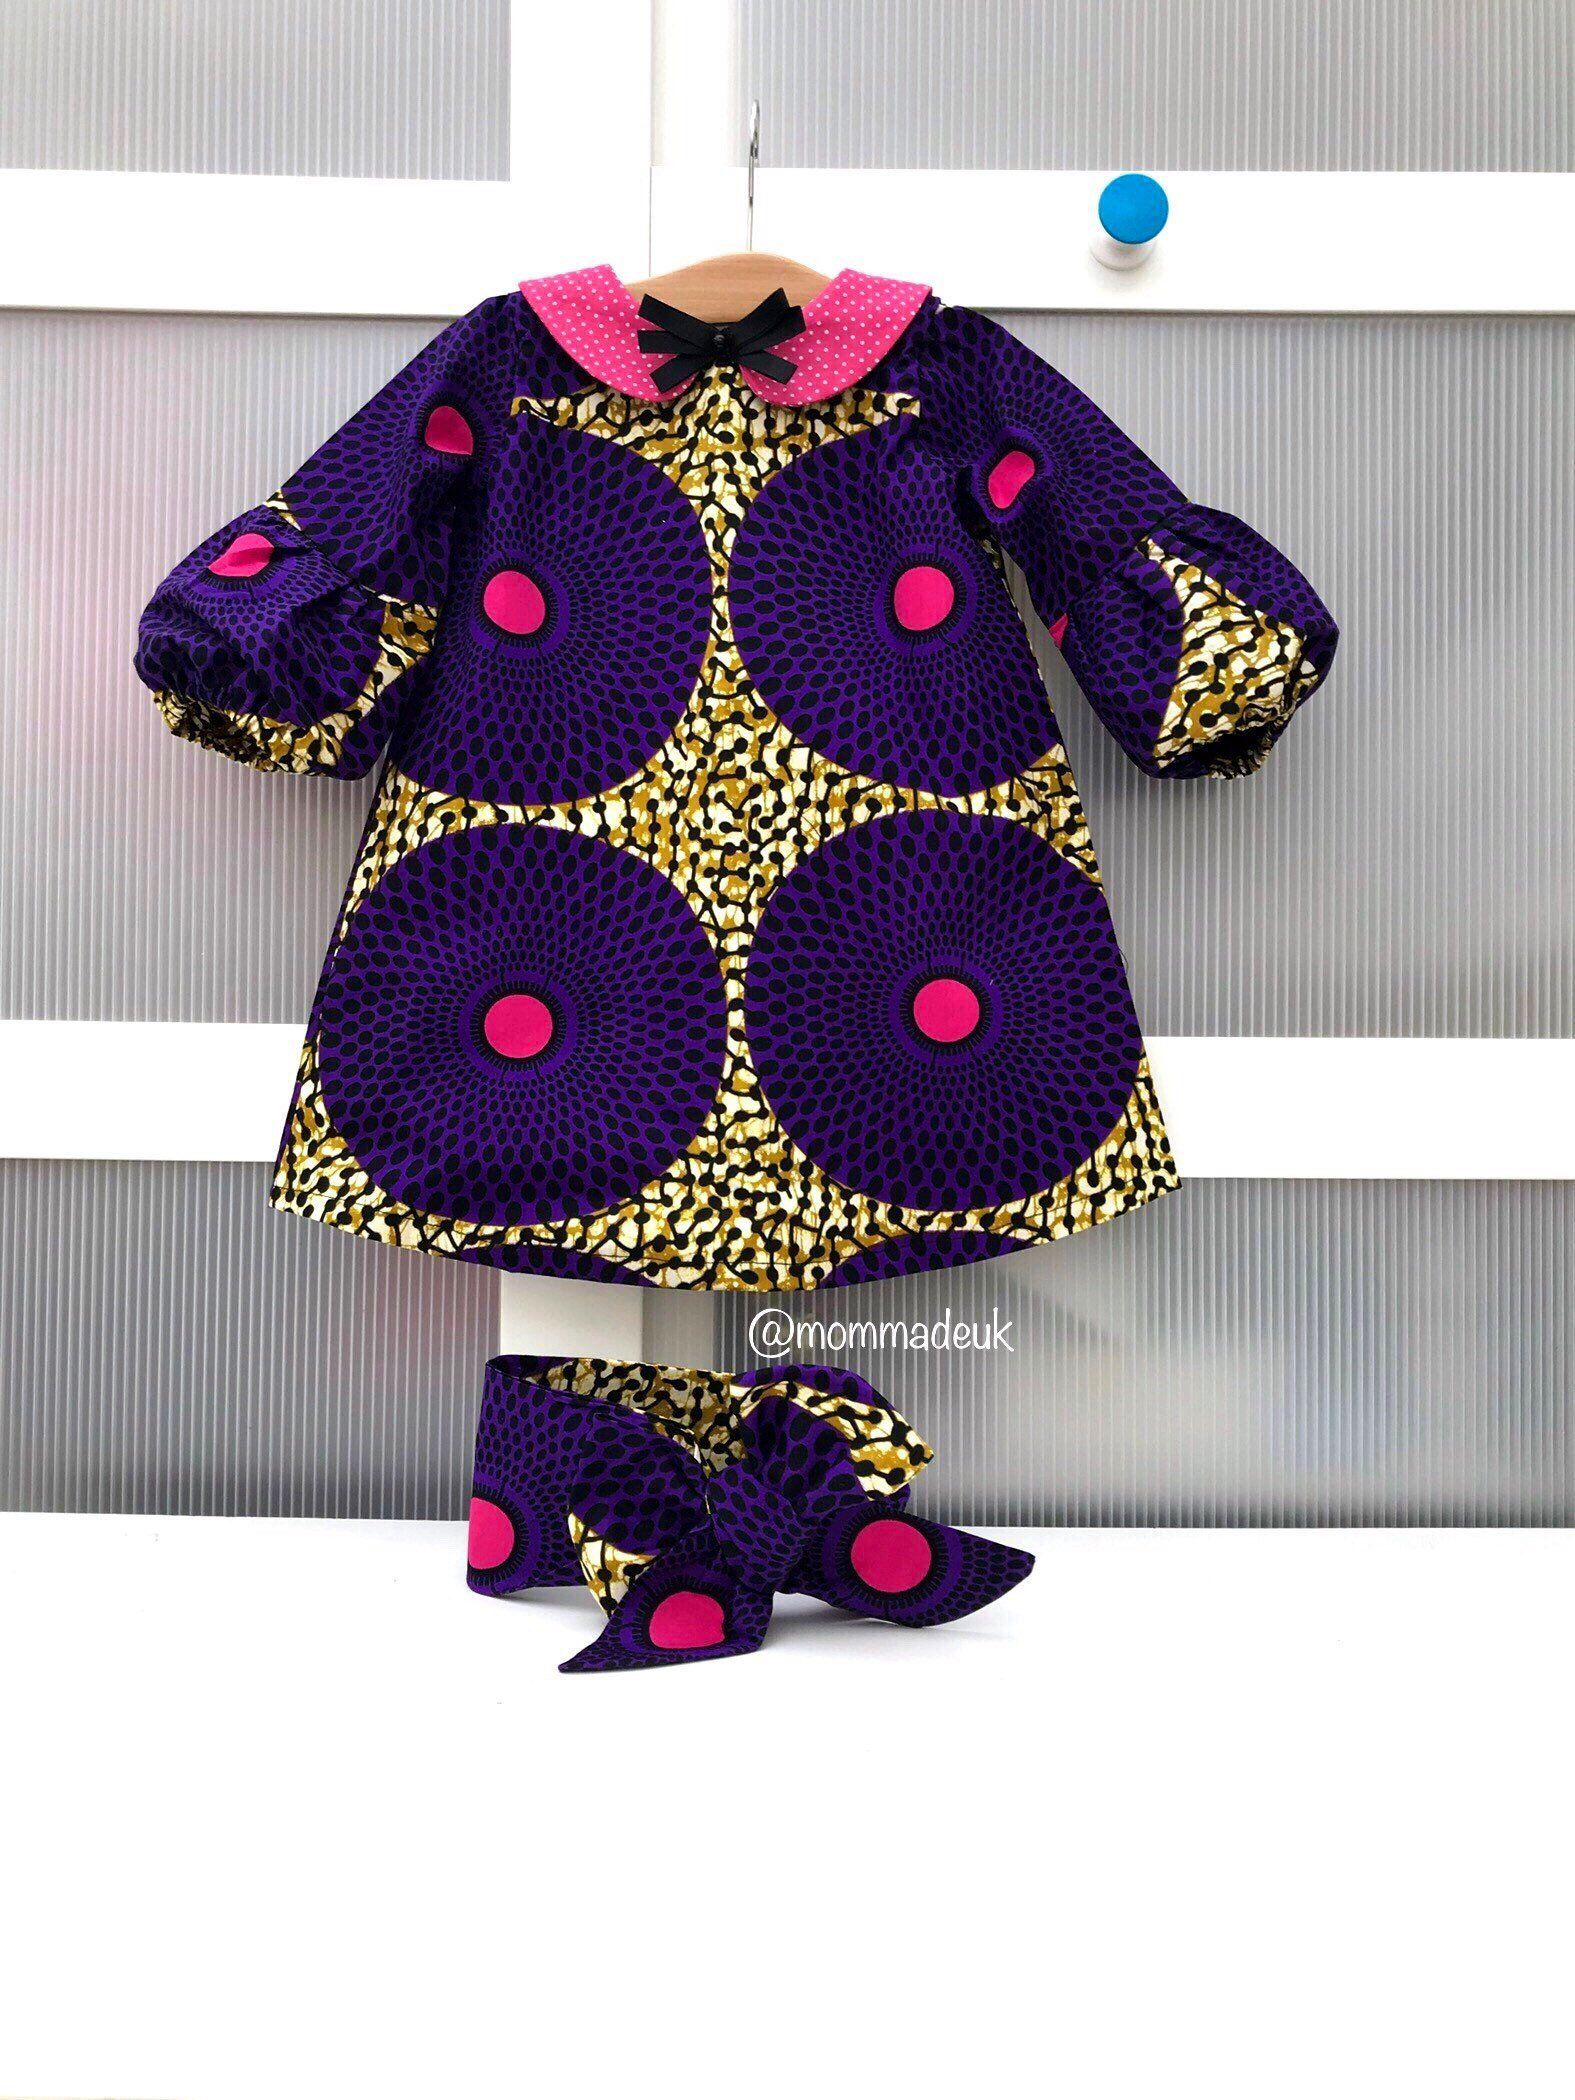 Anakara Skirt.Purple and Gold Baby Girl/'s Dress African Clothing Baby Ankara